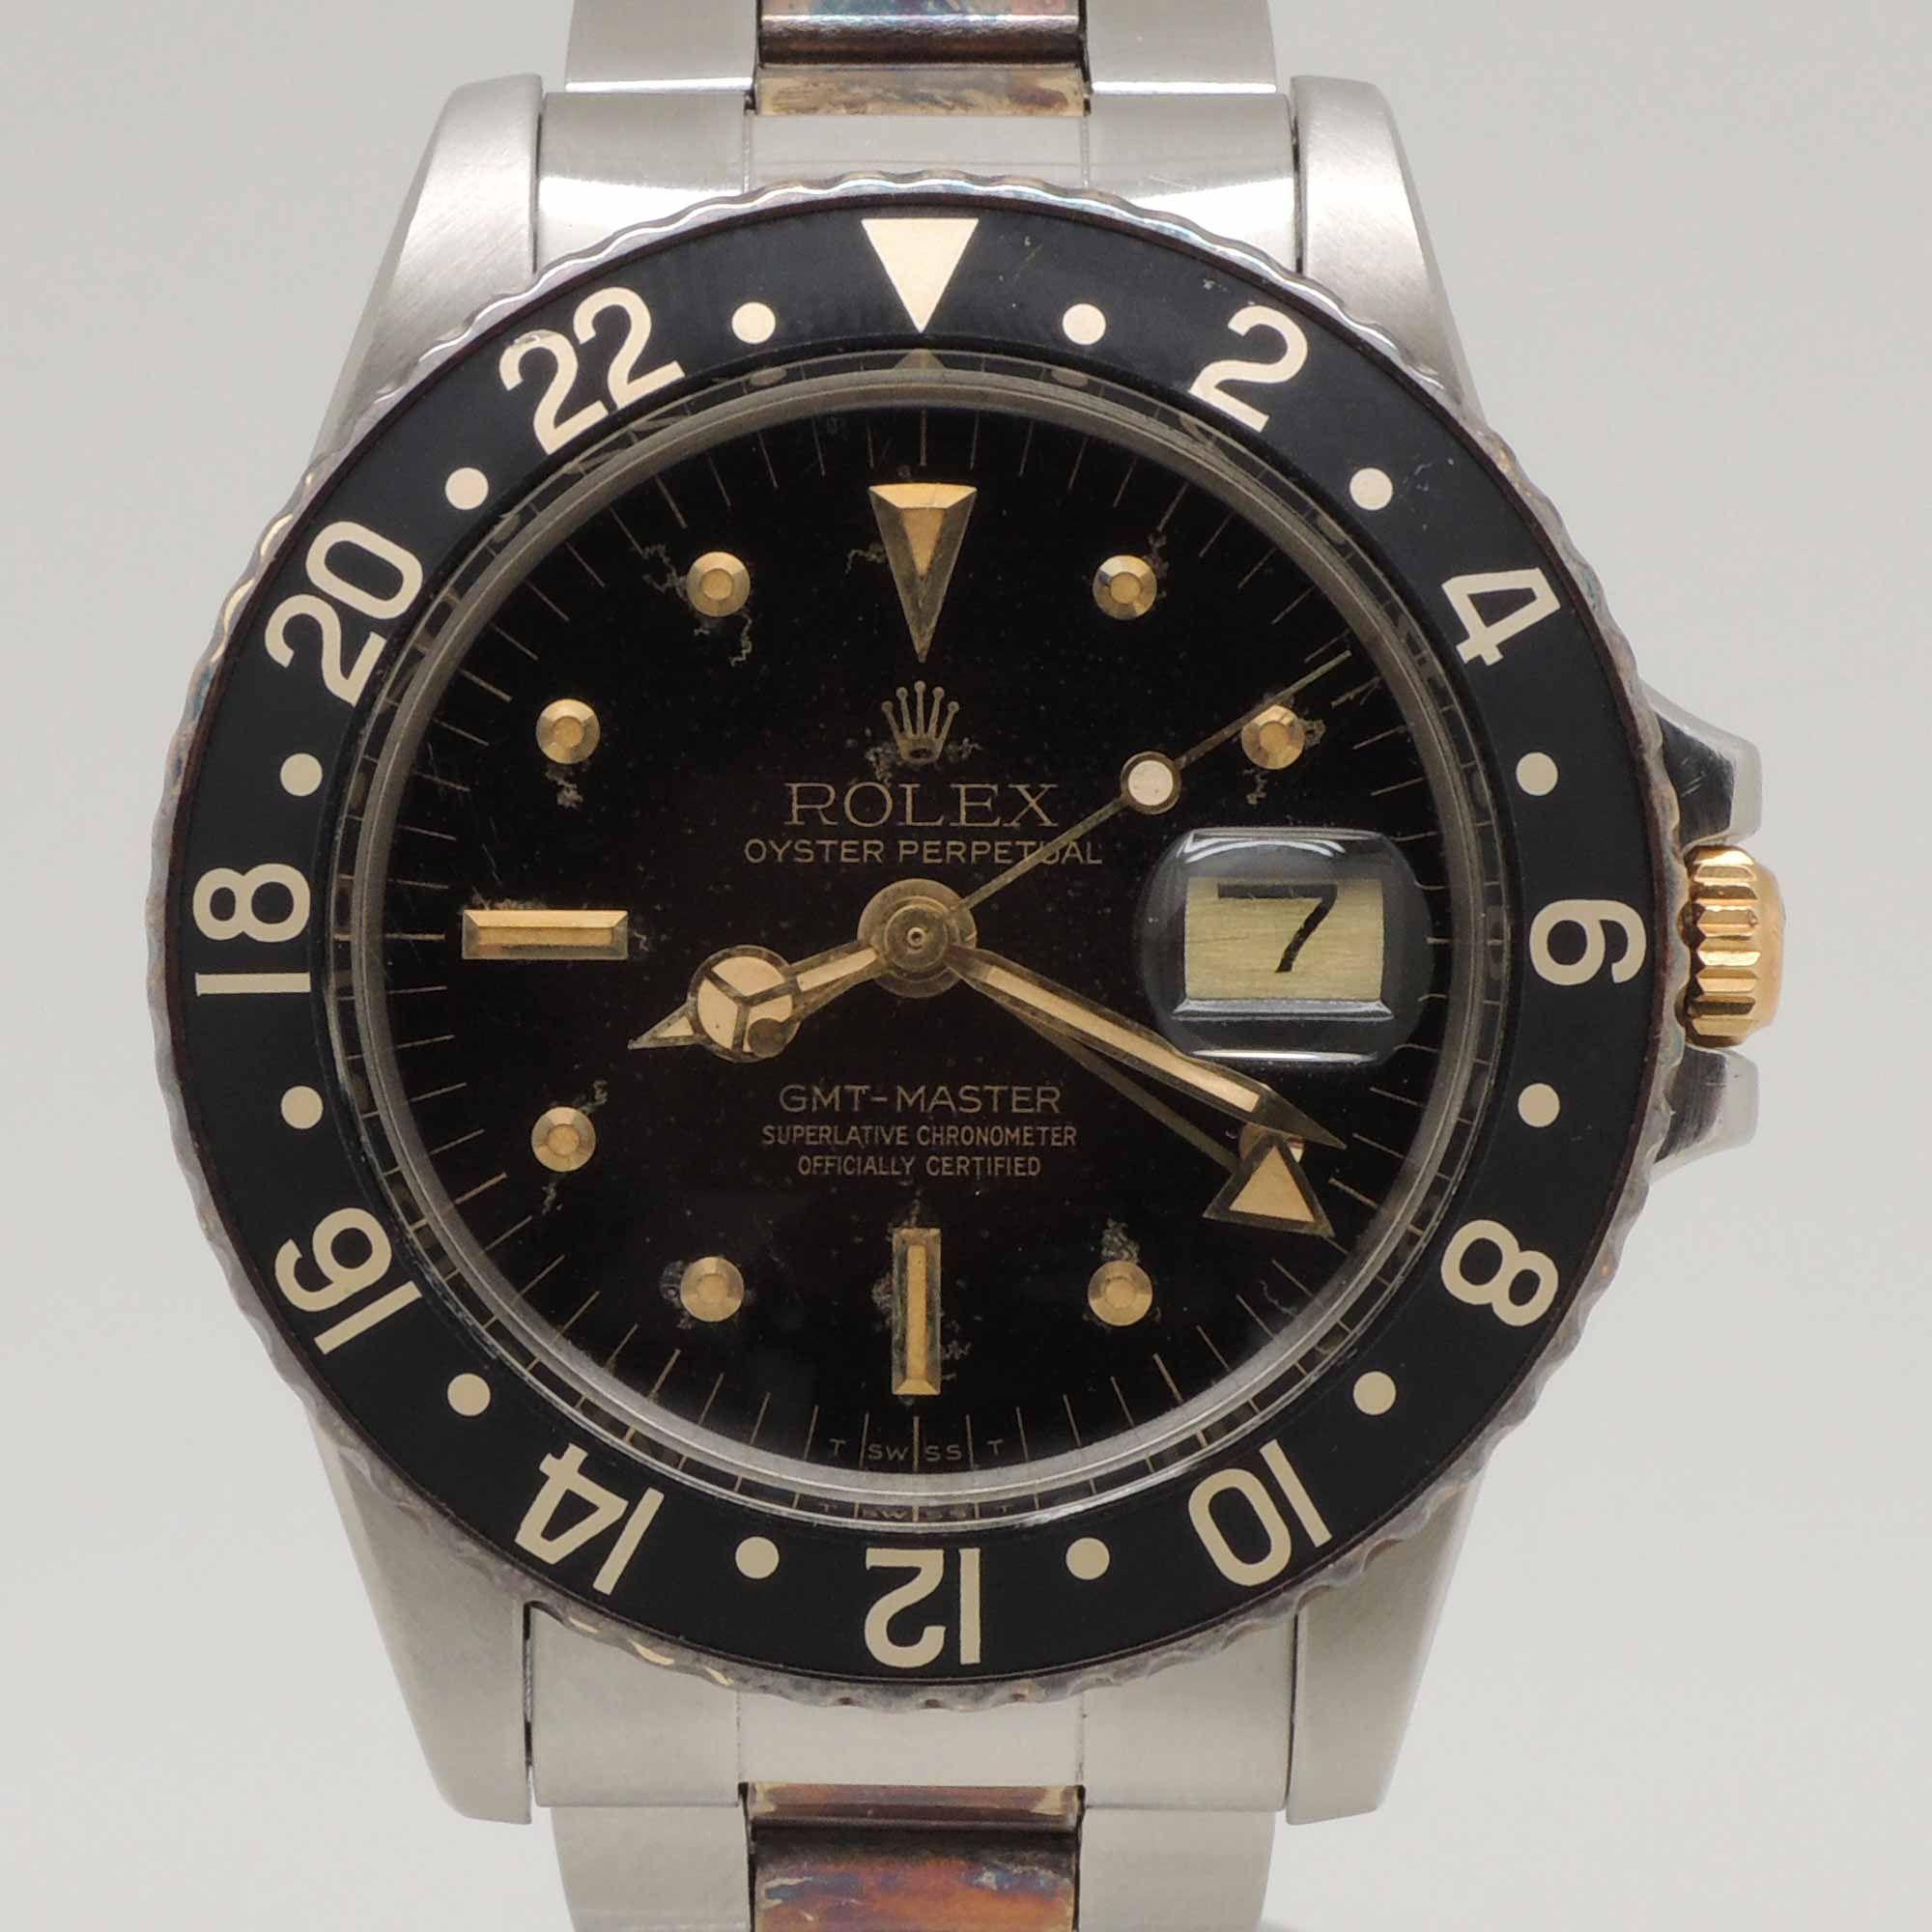 Ancienne Vintage Gallery Watches For Men Rolex Watches Rolex Gmt Master